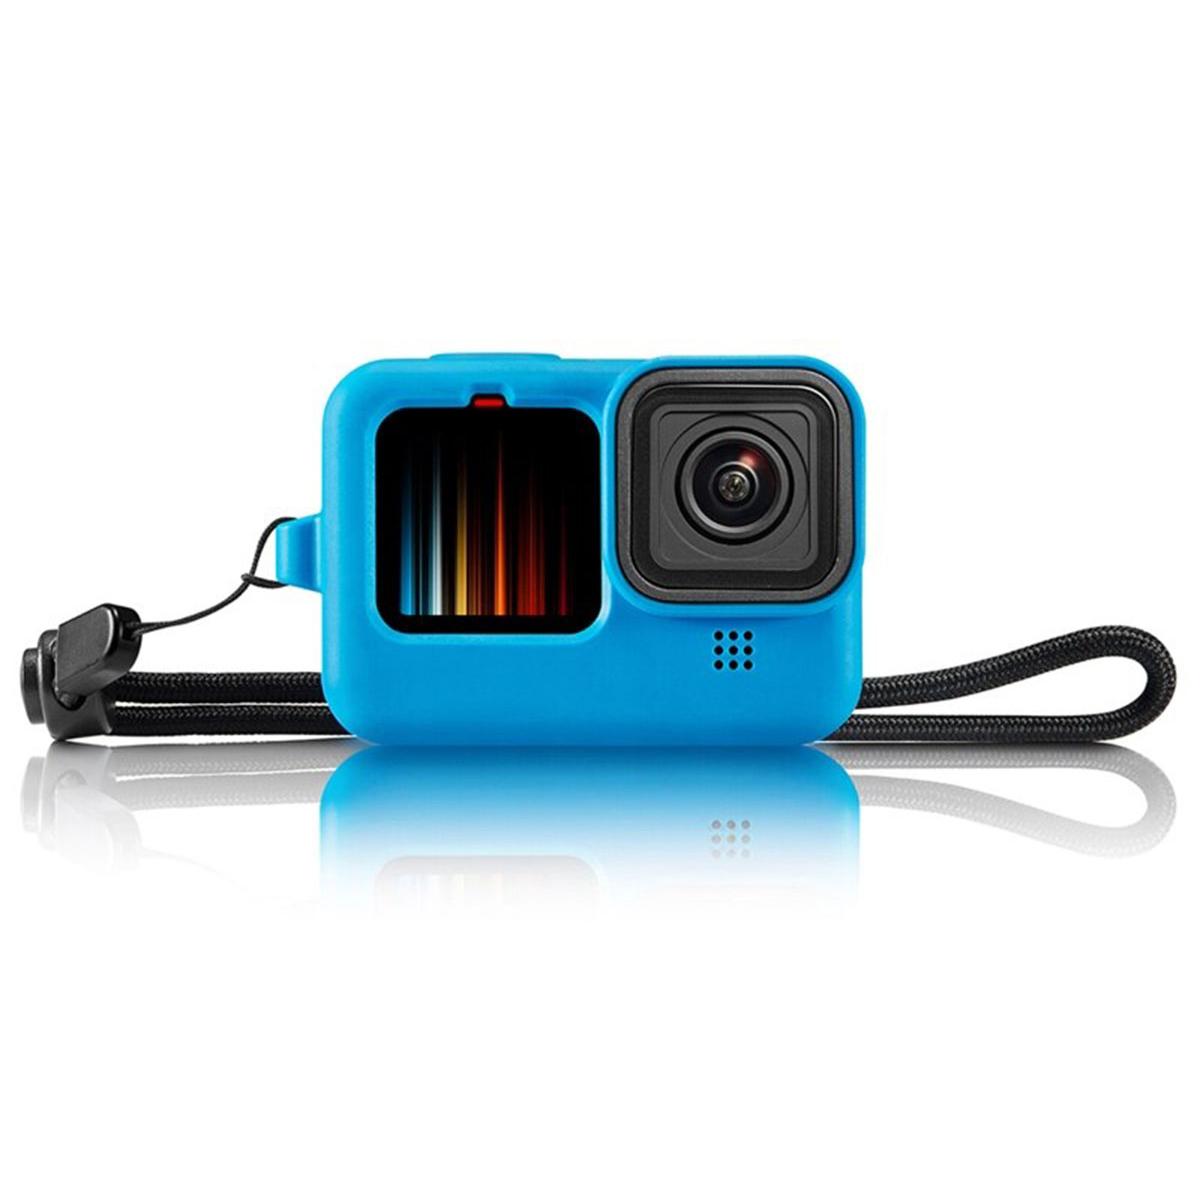 Kit Proteção - Caixa Estanque - Capa Silicone - Película Vidro para GoPro Hero9 e Hero10 - Shoot